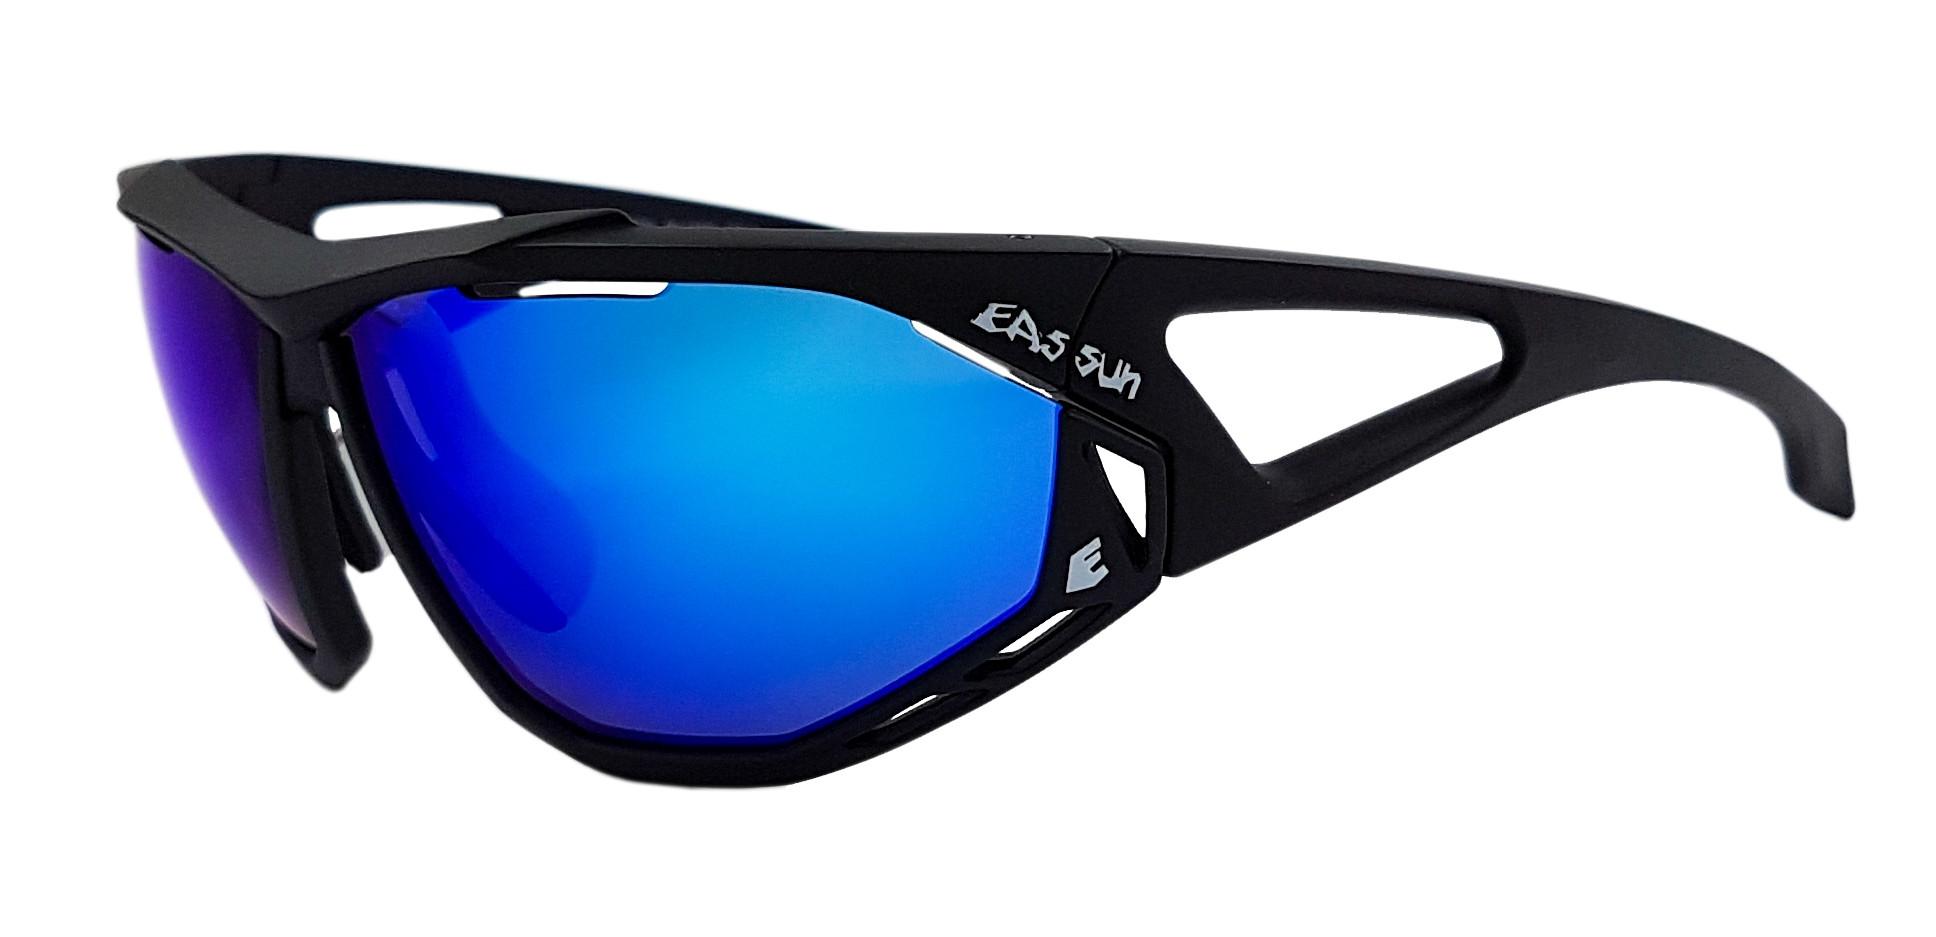 EASSUN EPIC 73202